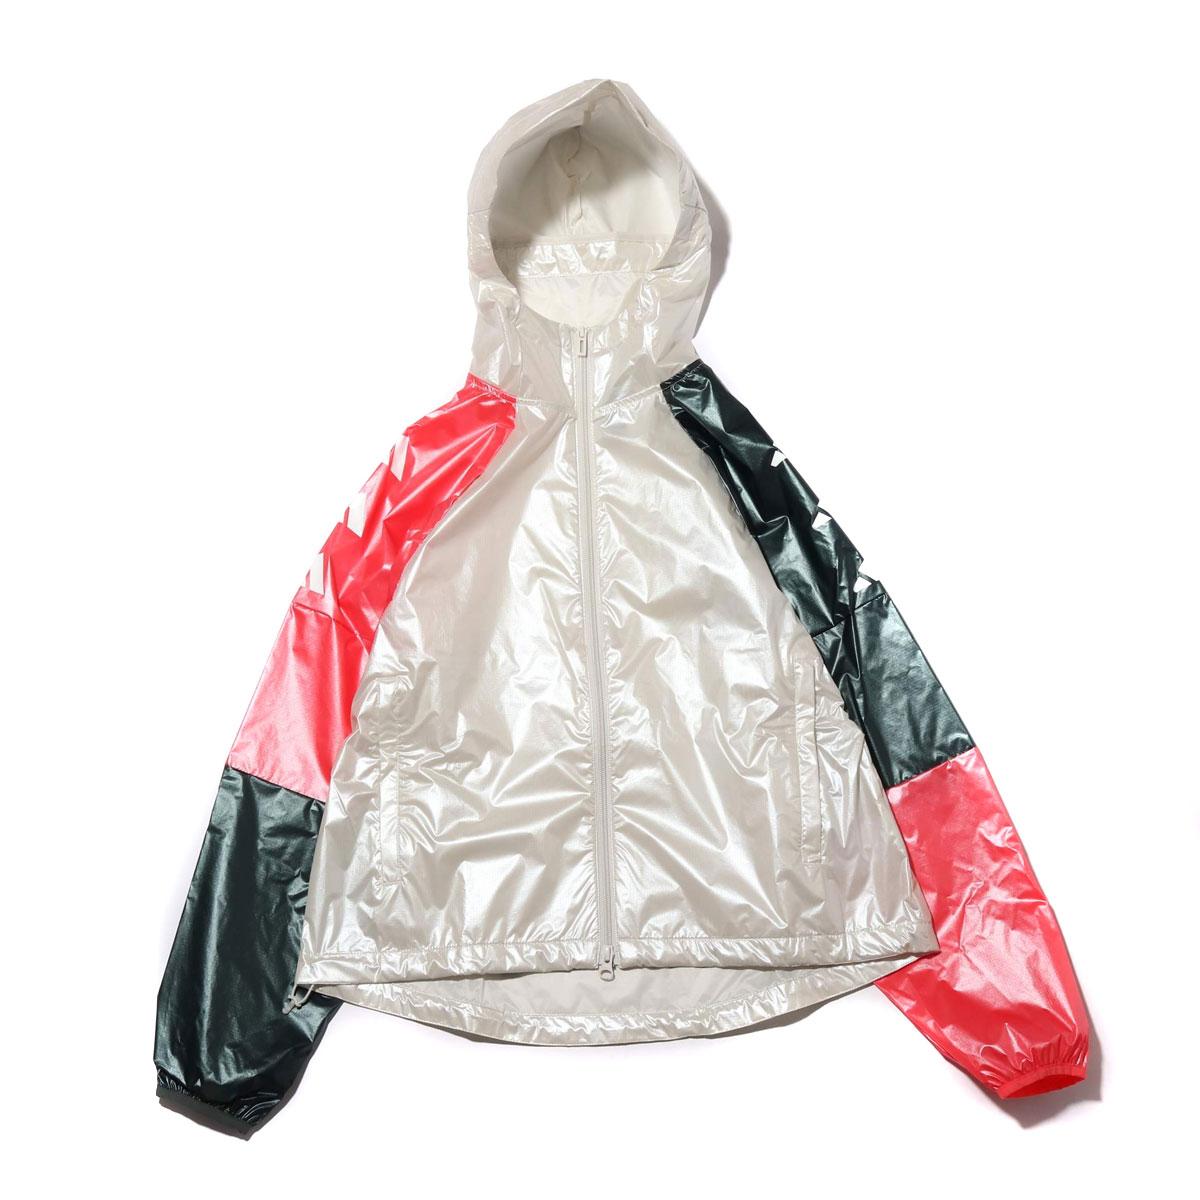 adidas Originals W THE PACK WIND JACKET(RAW WHITE/LEGEND IVY/PRISM PINK)(アディダス オリジナルス W ザ パック ウインド ジャケット)【レディース】【ジャケット】【19SS-I】